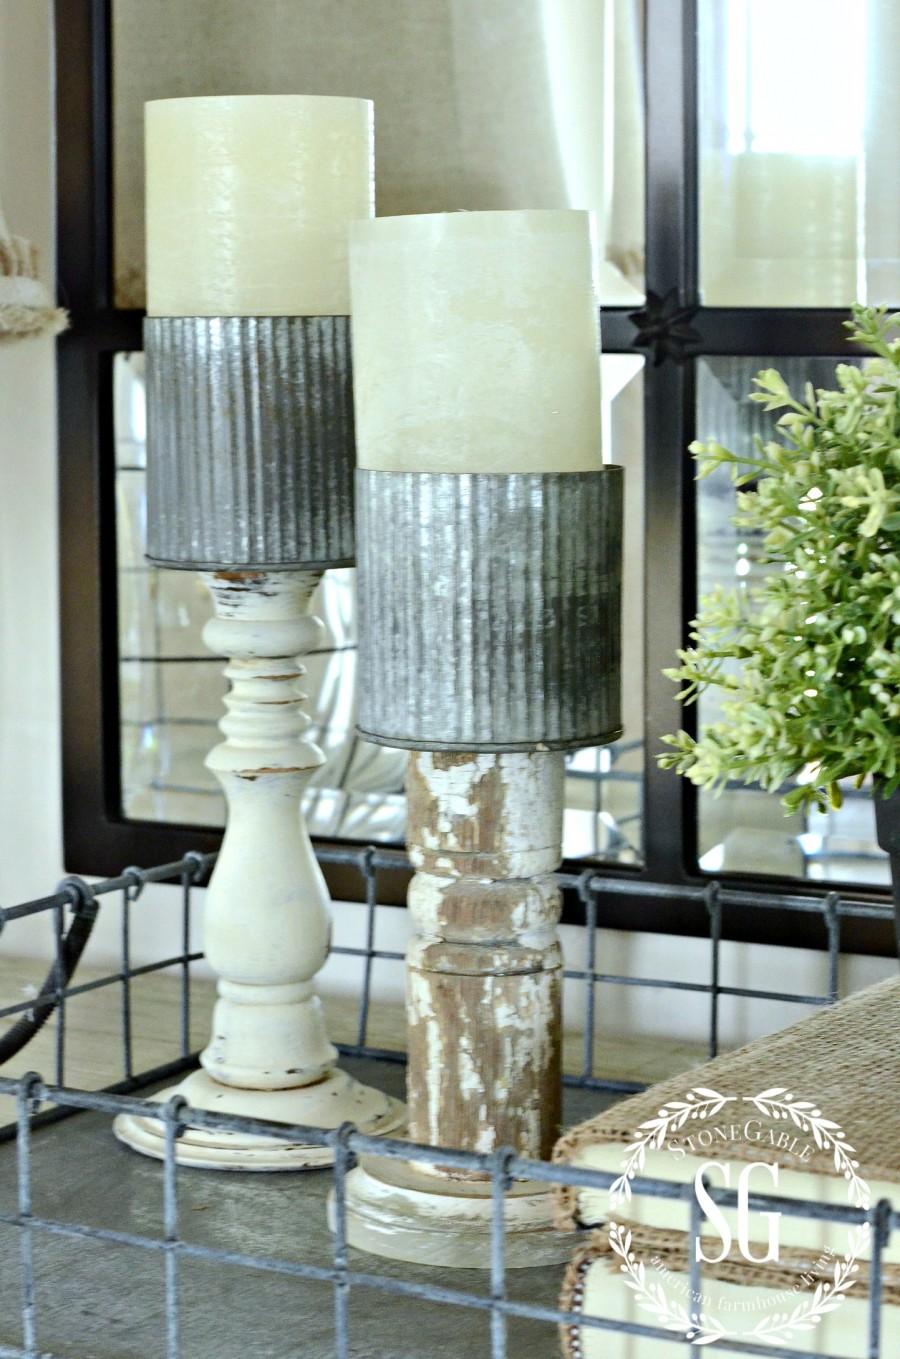 5 INEXPENSIVE WAYS TO REFRESH YOUR LIVING ROOM- Add something trendy-stonegableblog.com